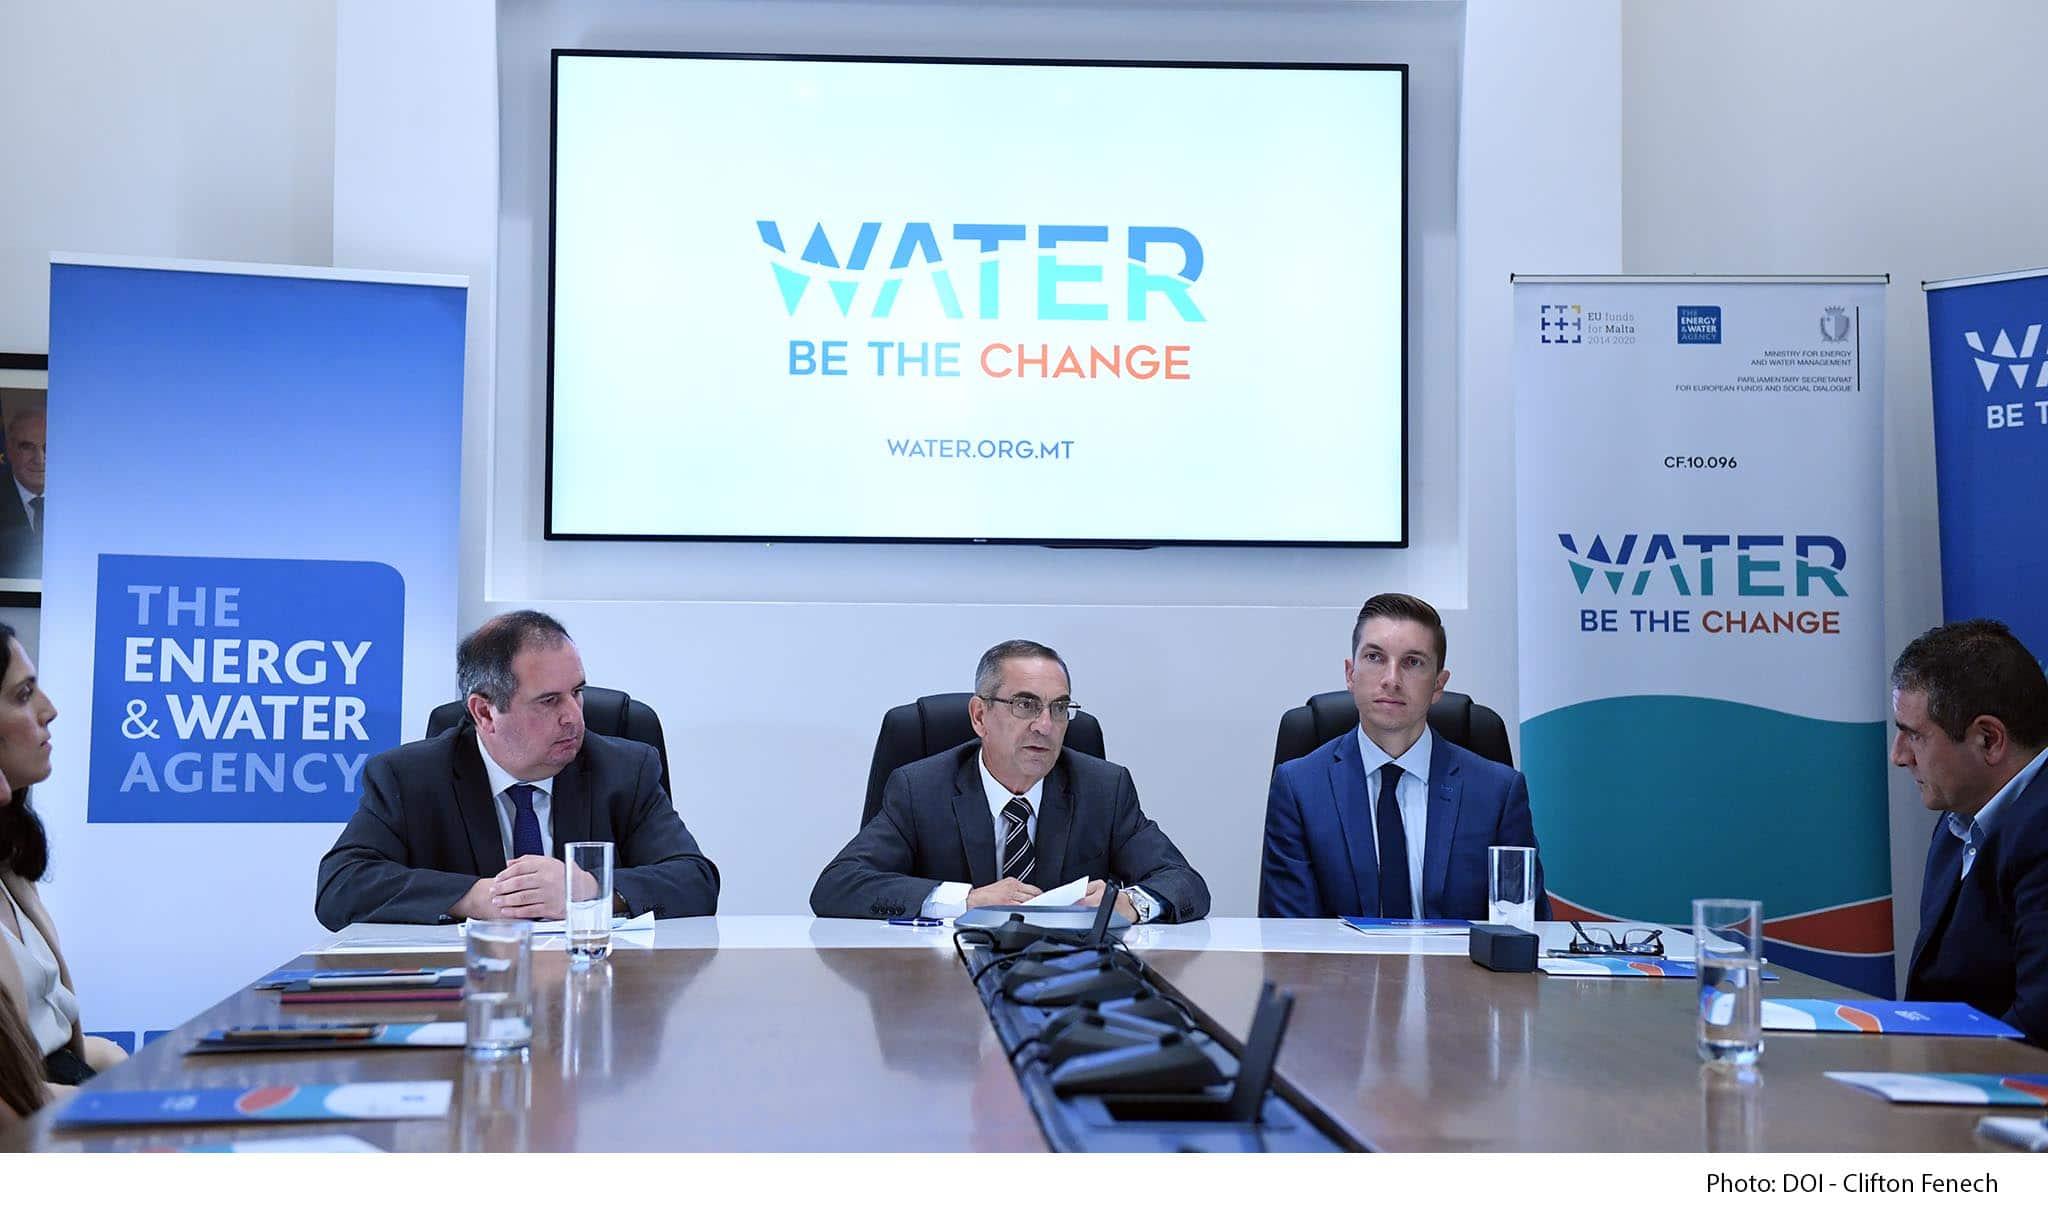 Joe Mizzi Manuel Sapiano Michael Schembri Launch water campaign